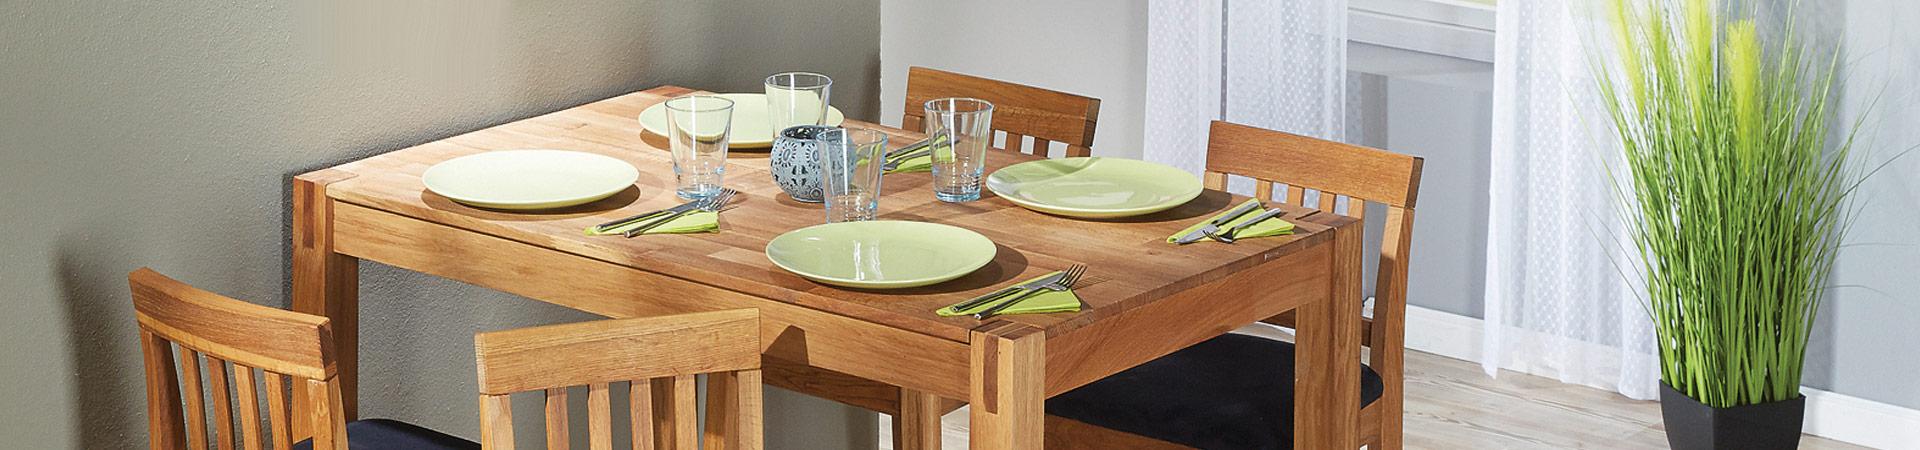 kitchen_livingroom_tables